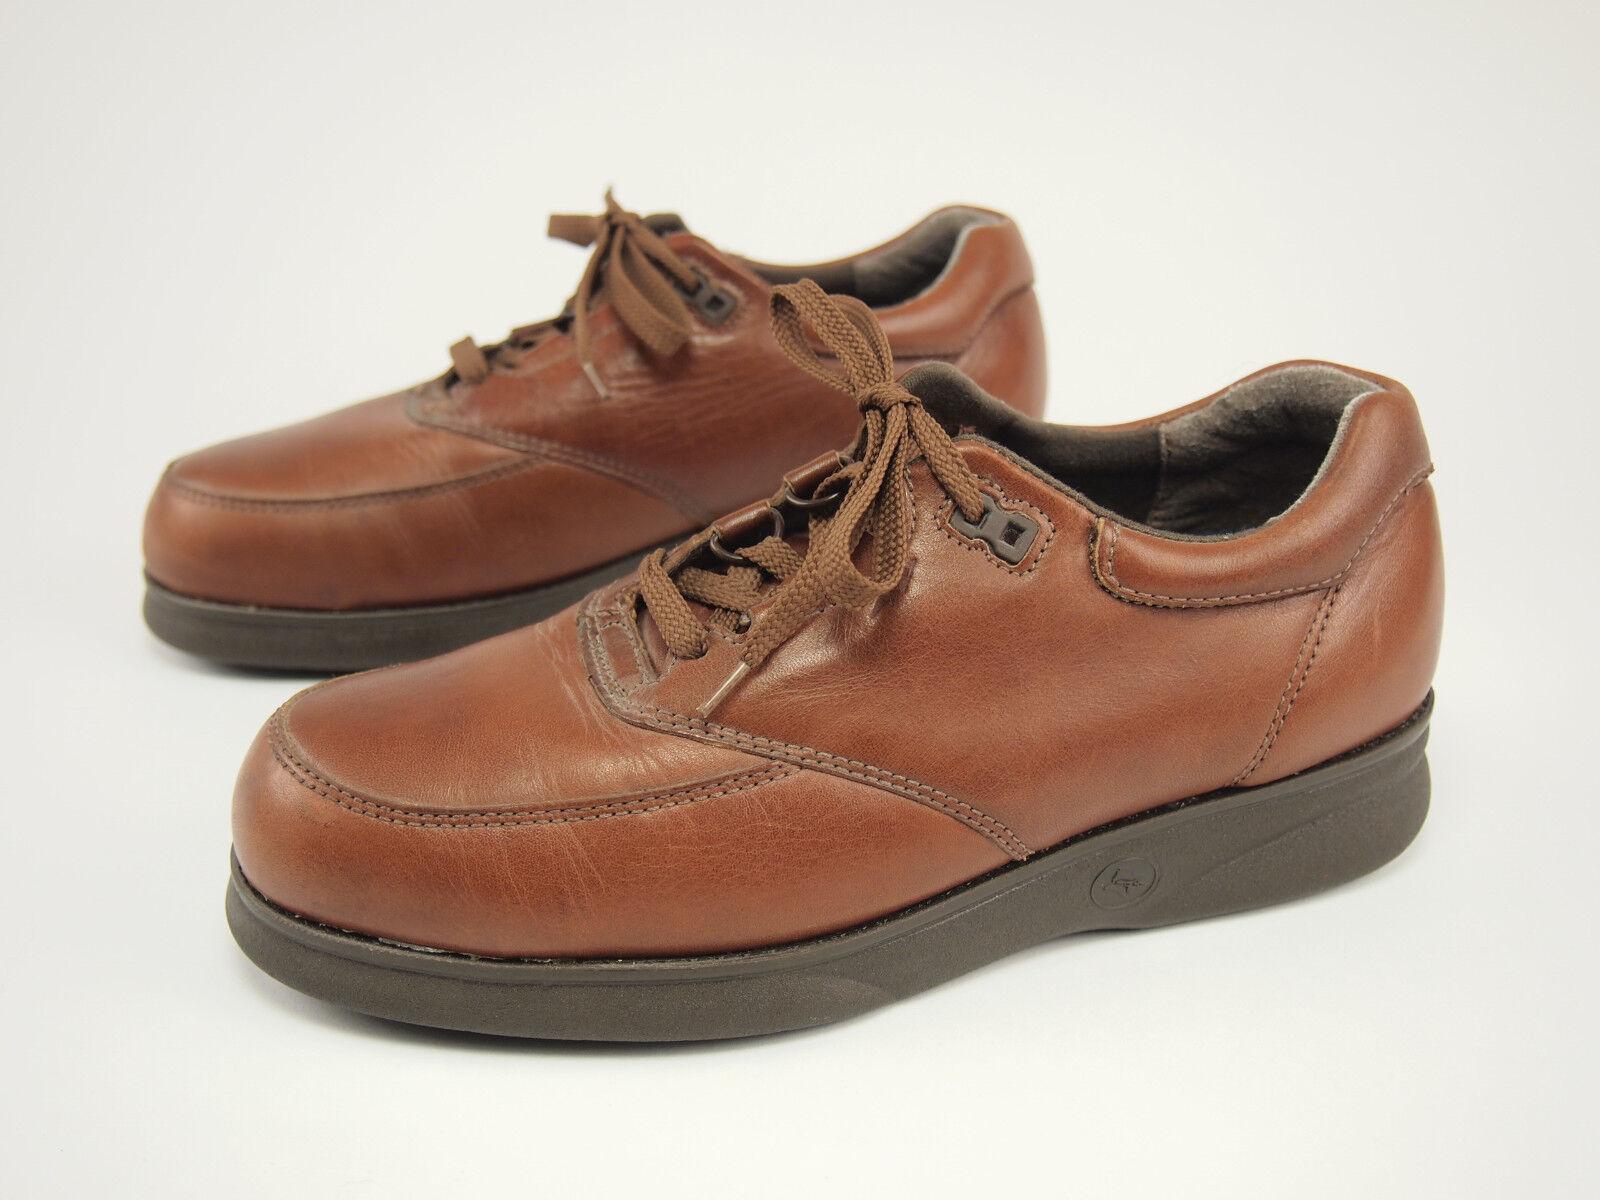 1990s CAROLINA Vintage Brown Leather SD Steel Toe Work Oxfords 7 EE